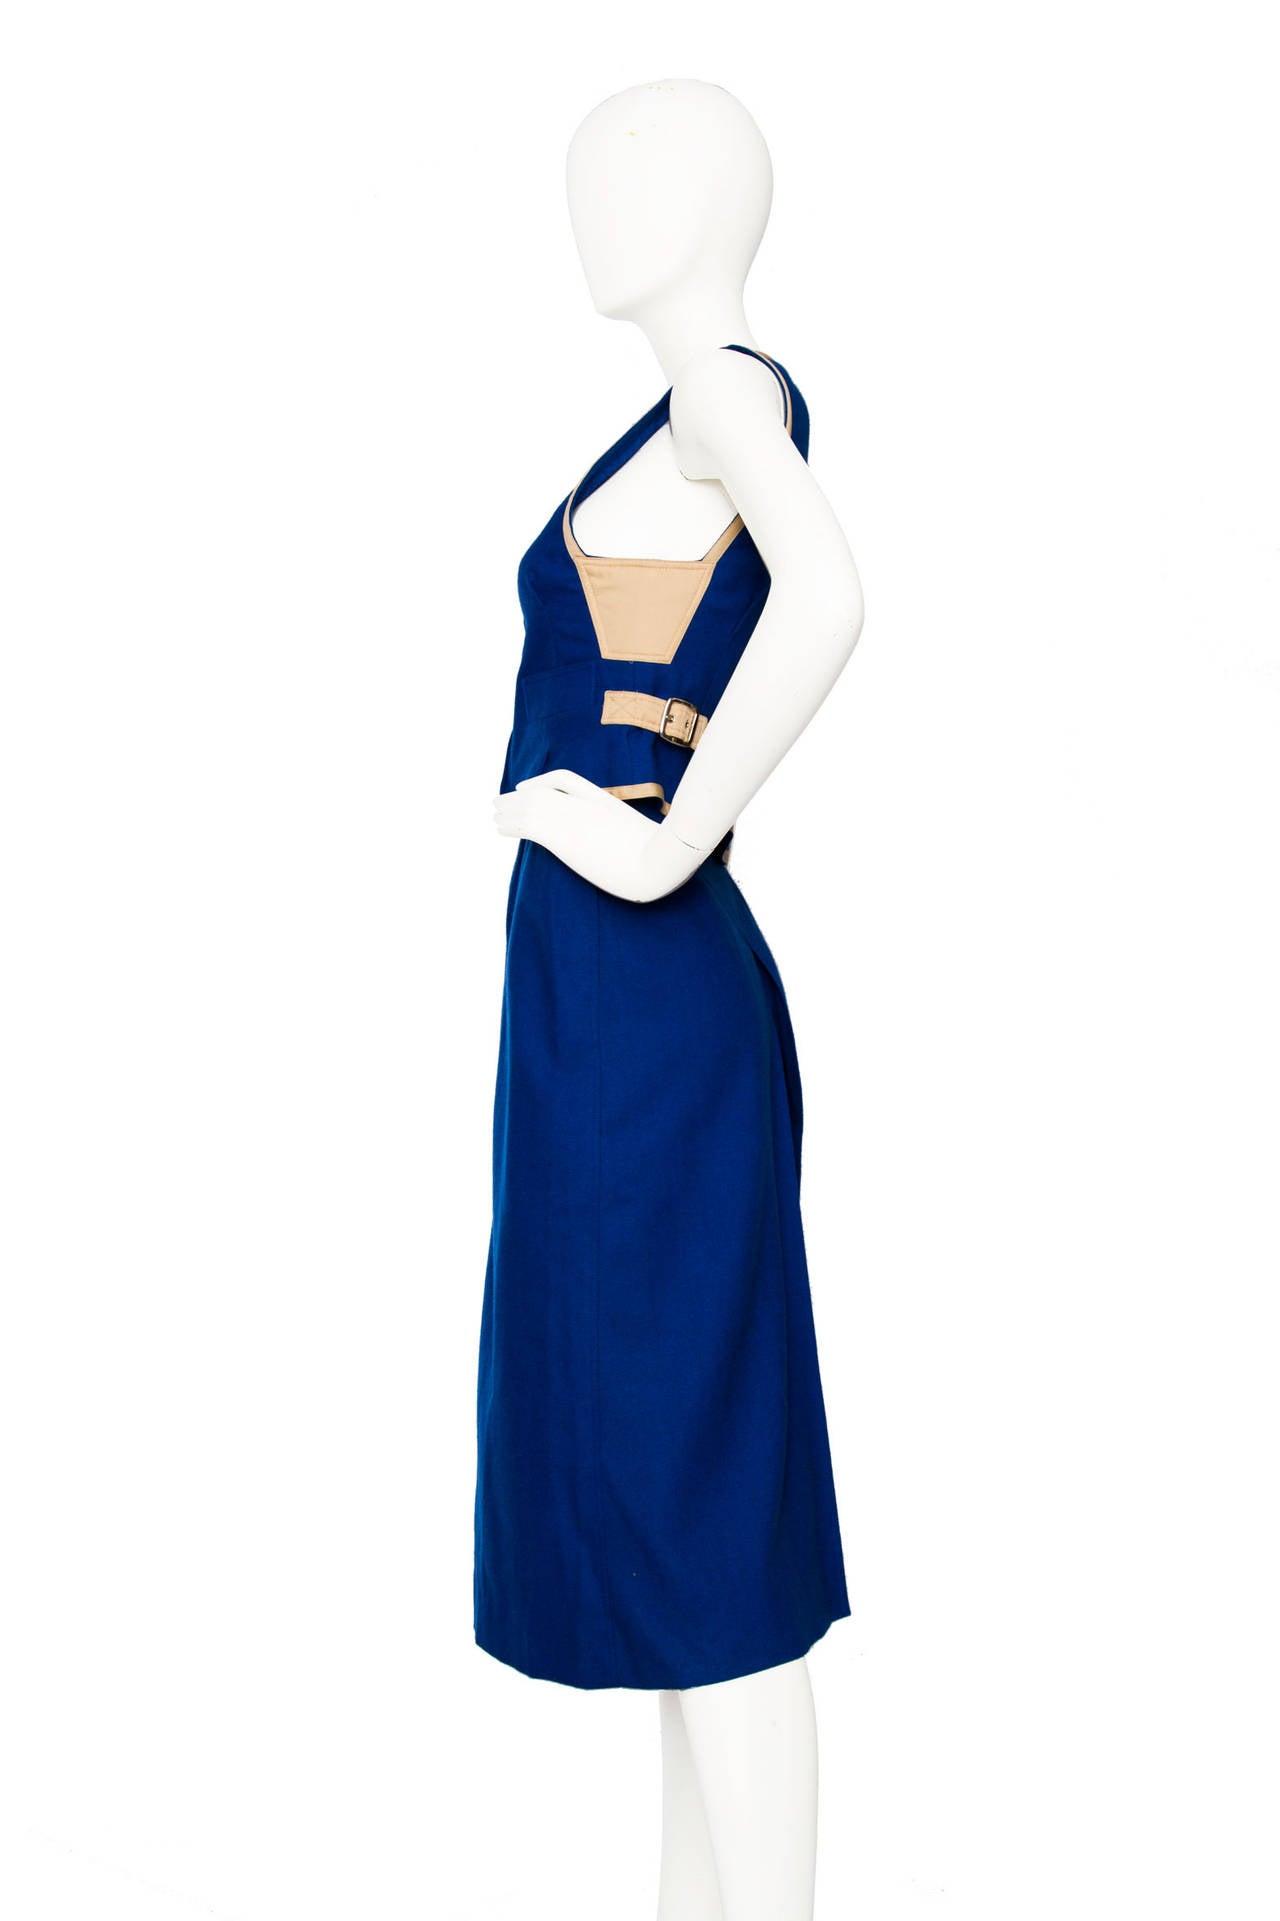 Rare 1960s Courrèges Electric Blue Wool Vest & Skirt Ensemble In Good Condition For Sale In Copenhagen, DK